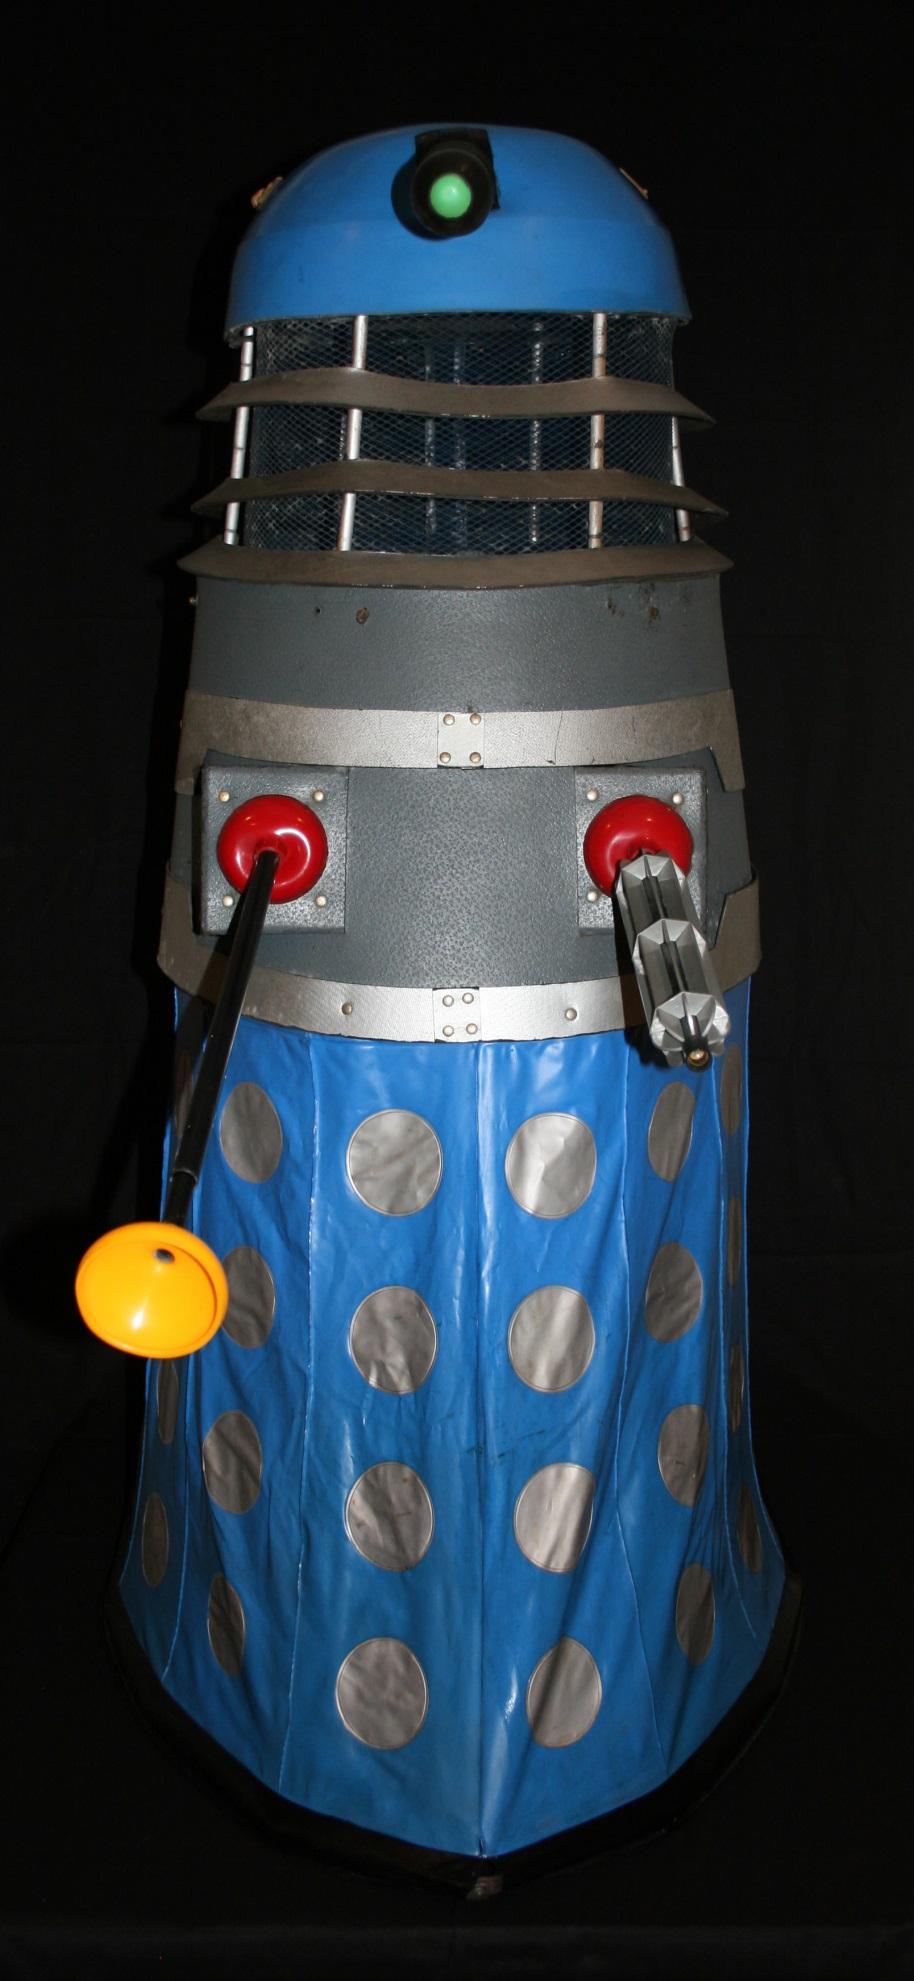 Scorpion Automotives Ltd. Dalek Playsuit